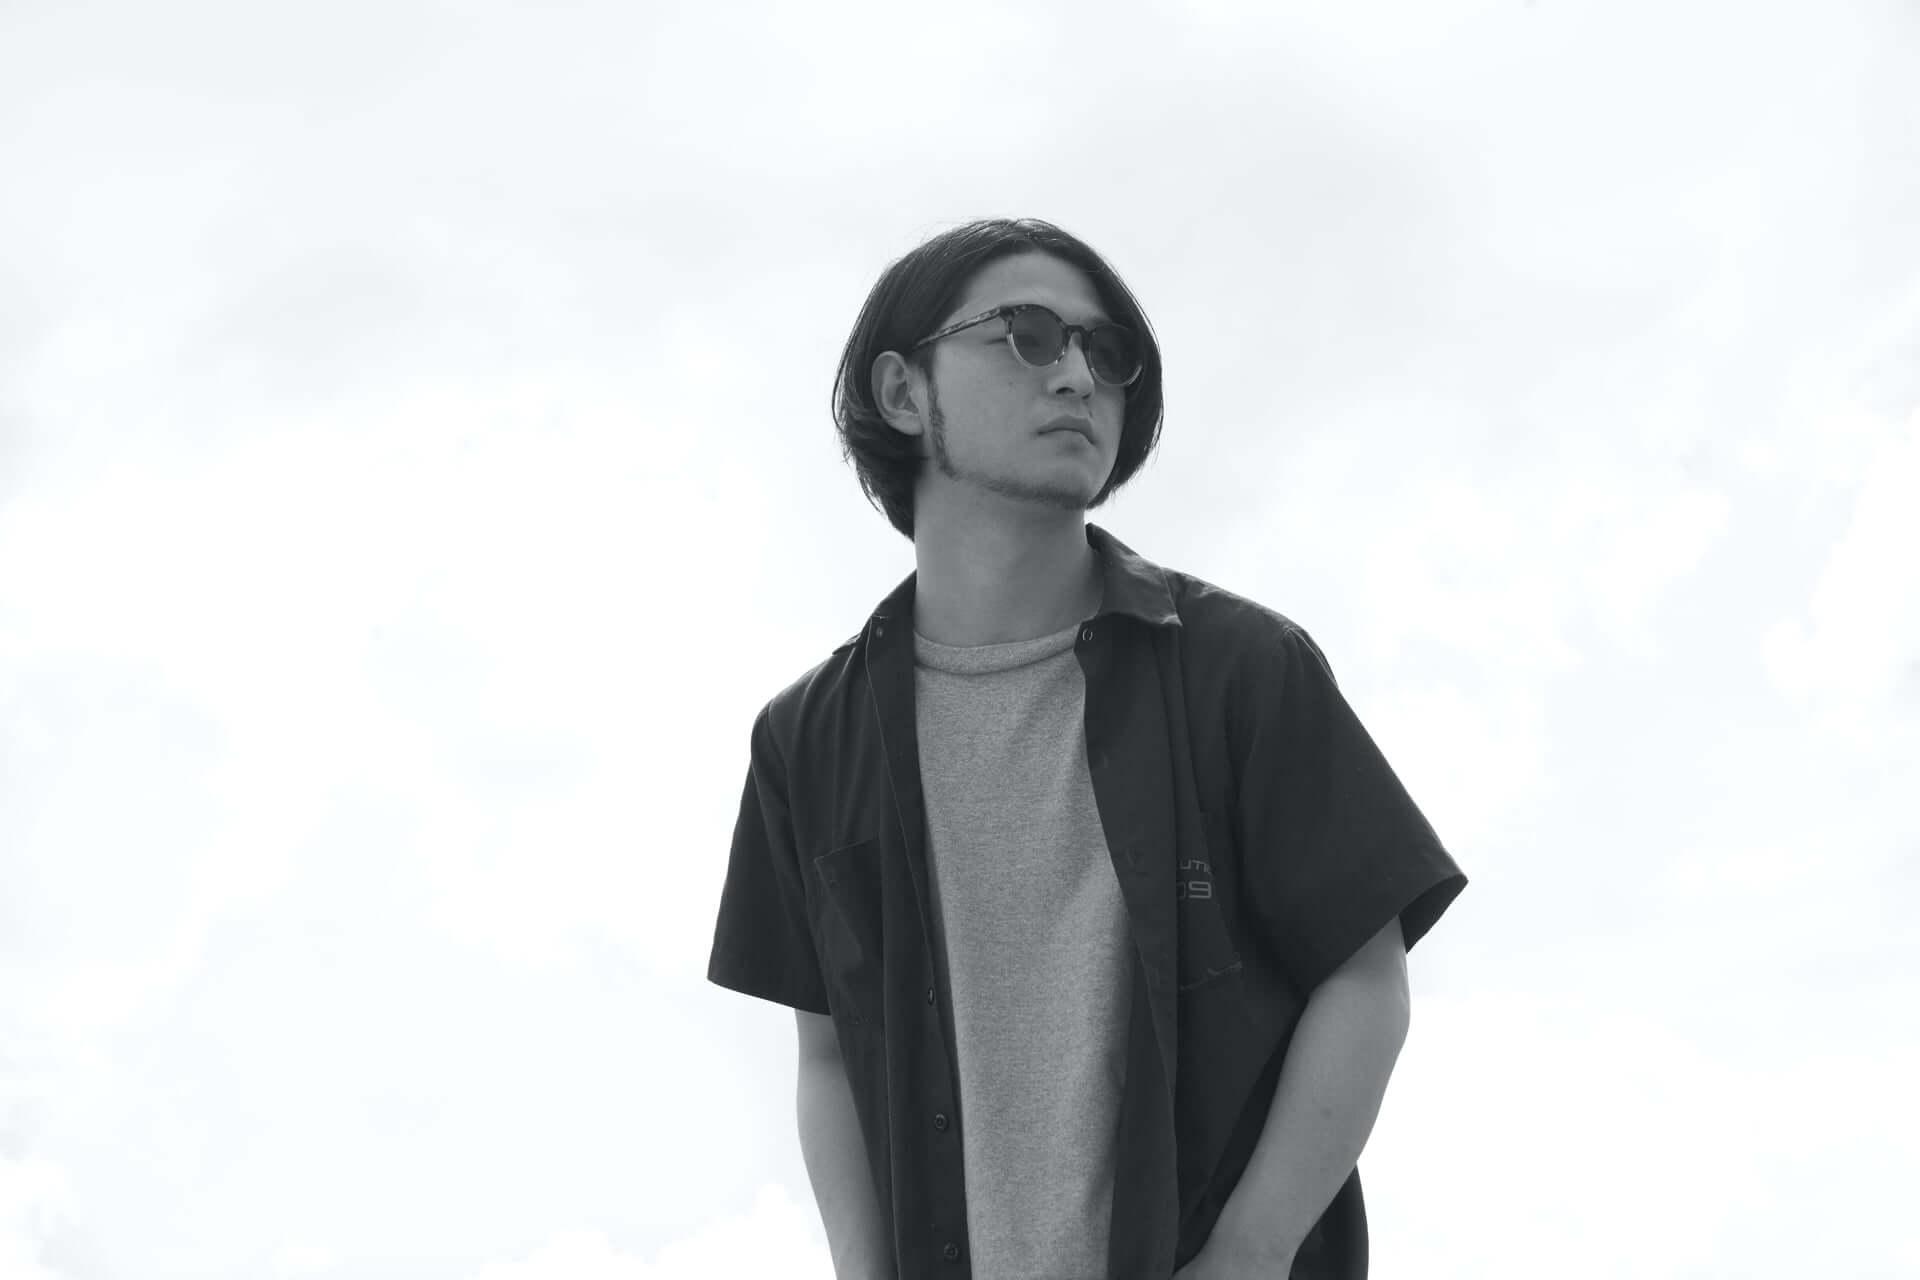 SOUNDS GOOD®︎とblock.fmのコラボ特番が本日放送|80KIDZ、TAAR、Shin Sakiuraが「ホームサンプリング」 music200527_soundsgood_8-1920x1280